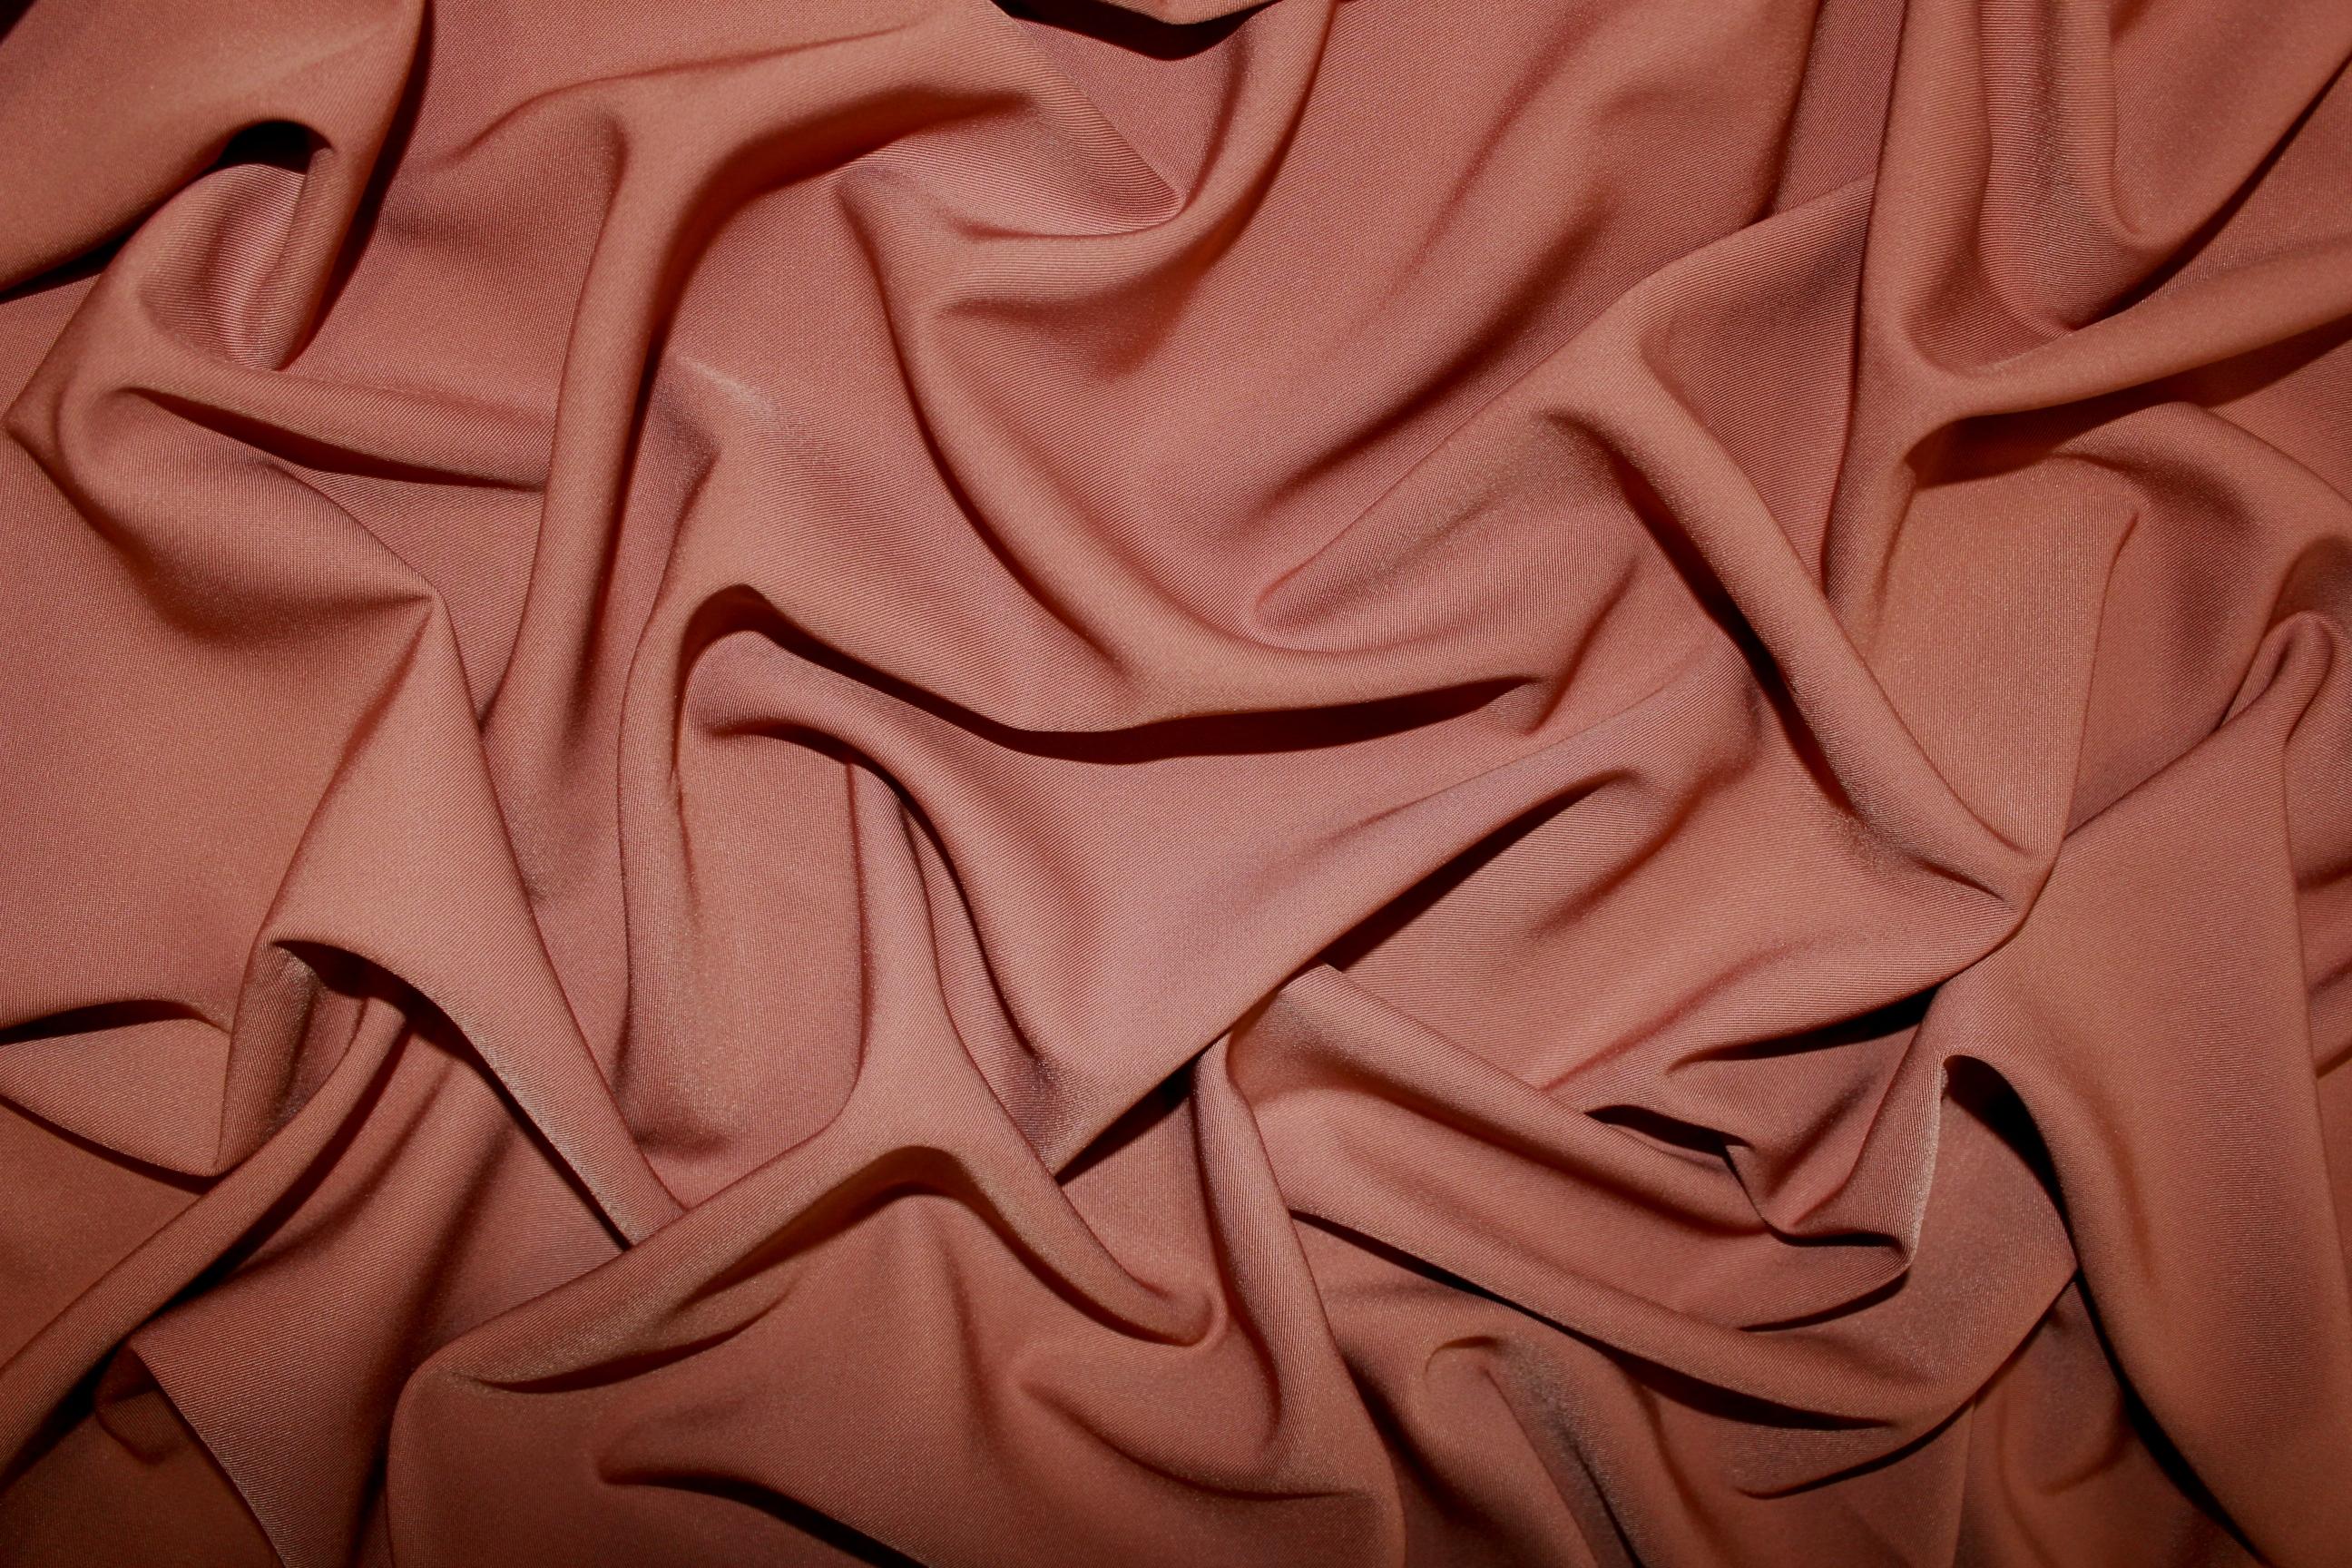 df297ee20f2cae Костюмна тканина Лагуна колір терракот, Арт.16545 C#19 купити в ...